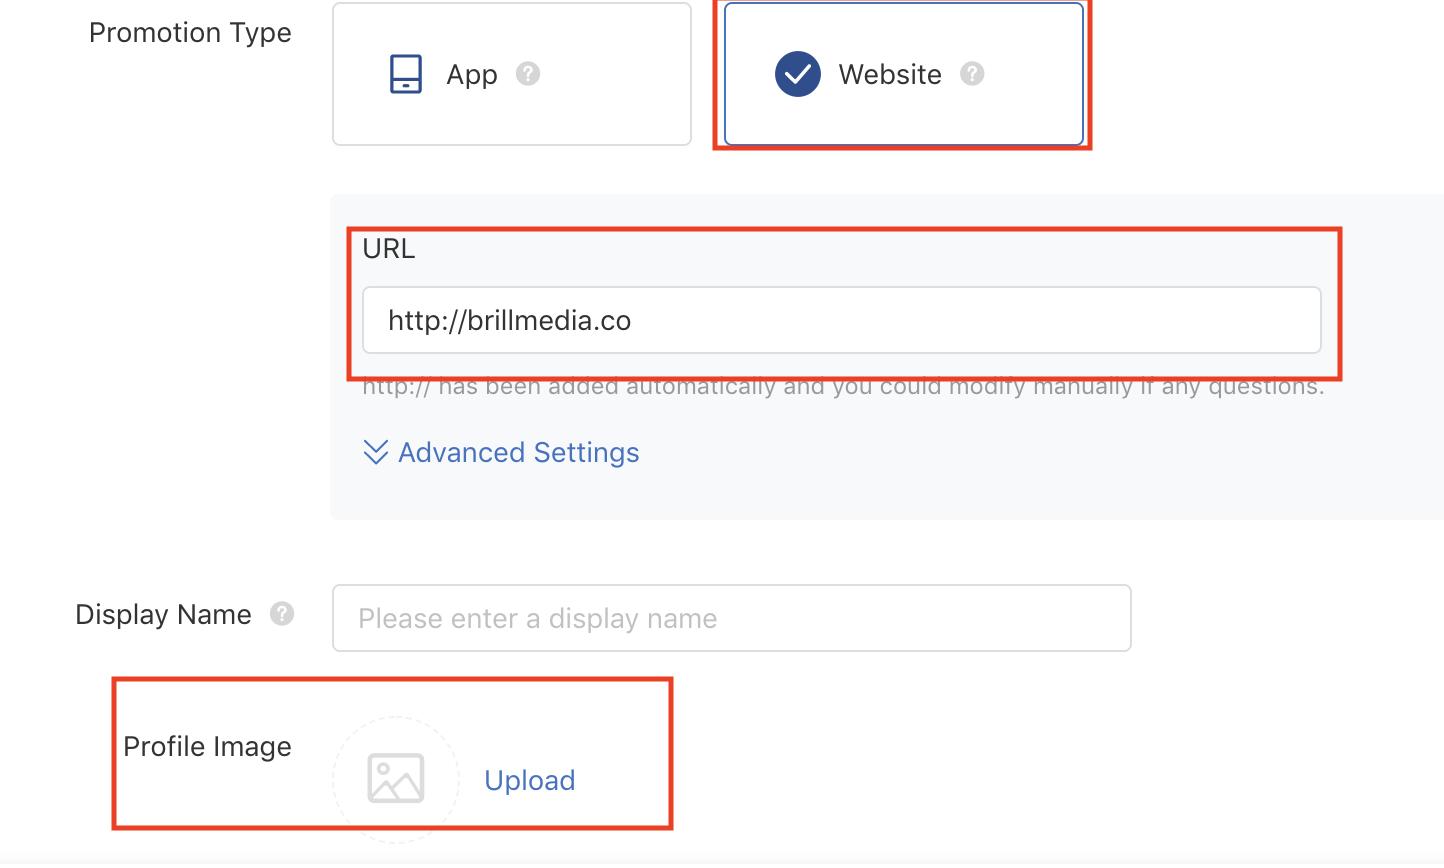 TicTok Promotion Type selection tool